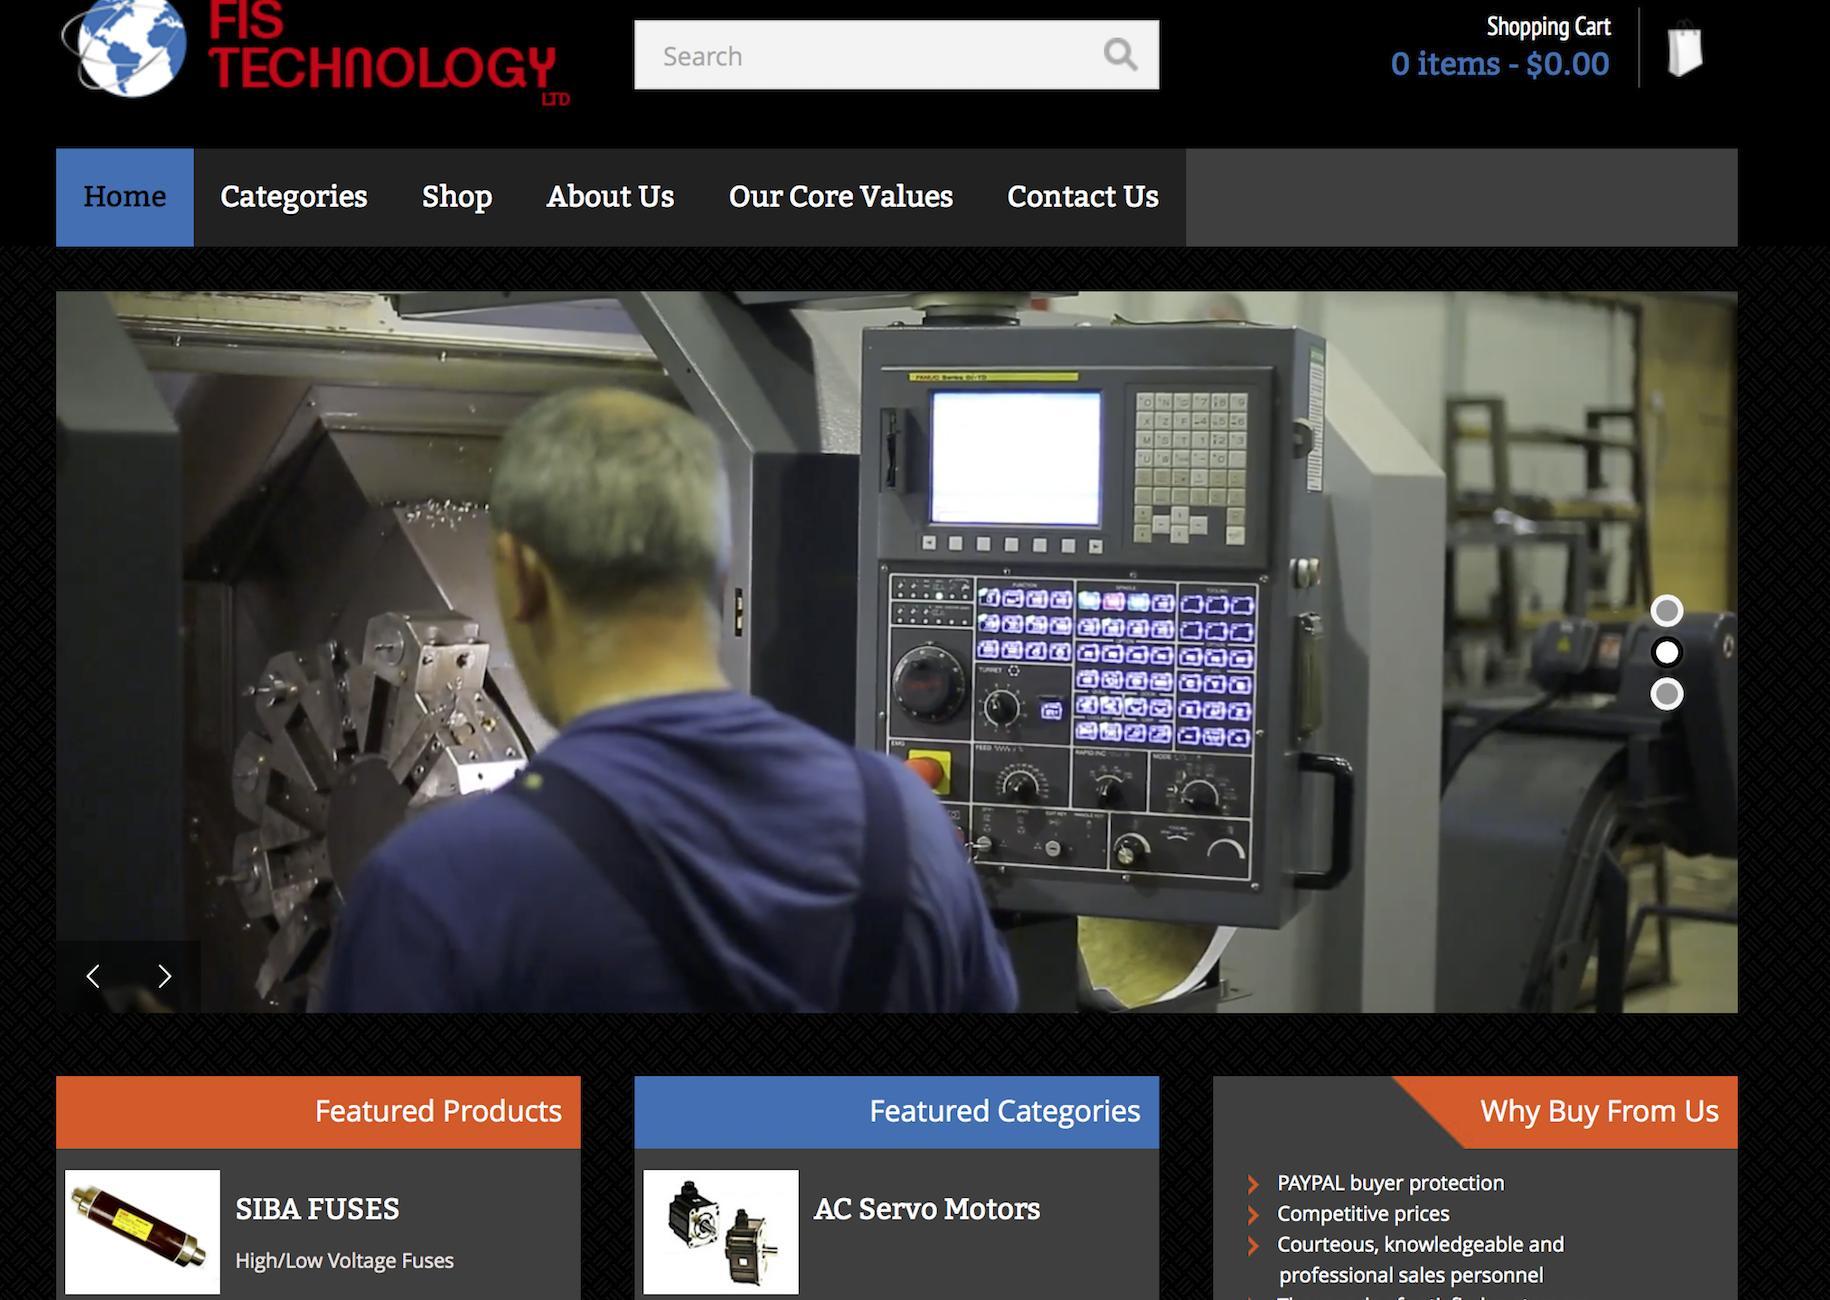 FIS TECHNOLOGY